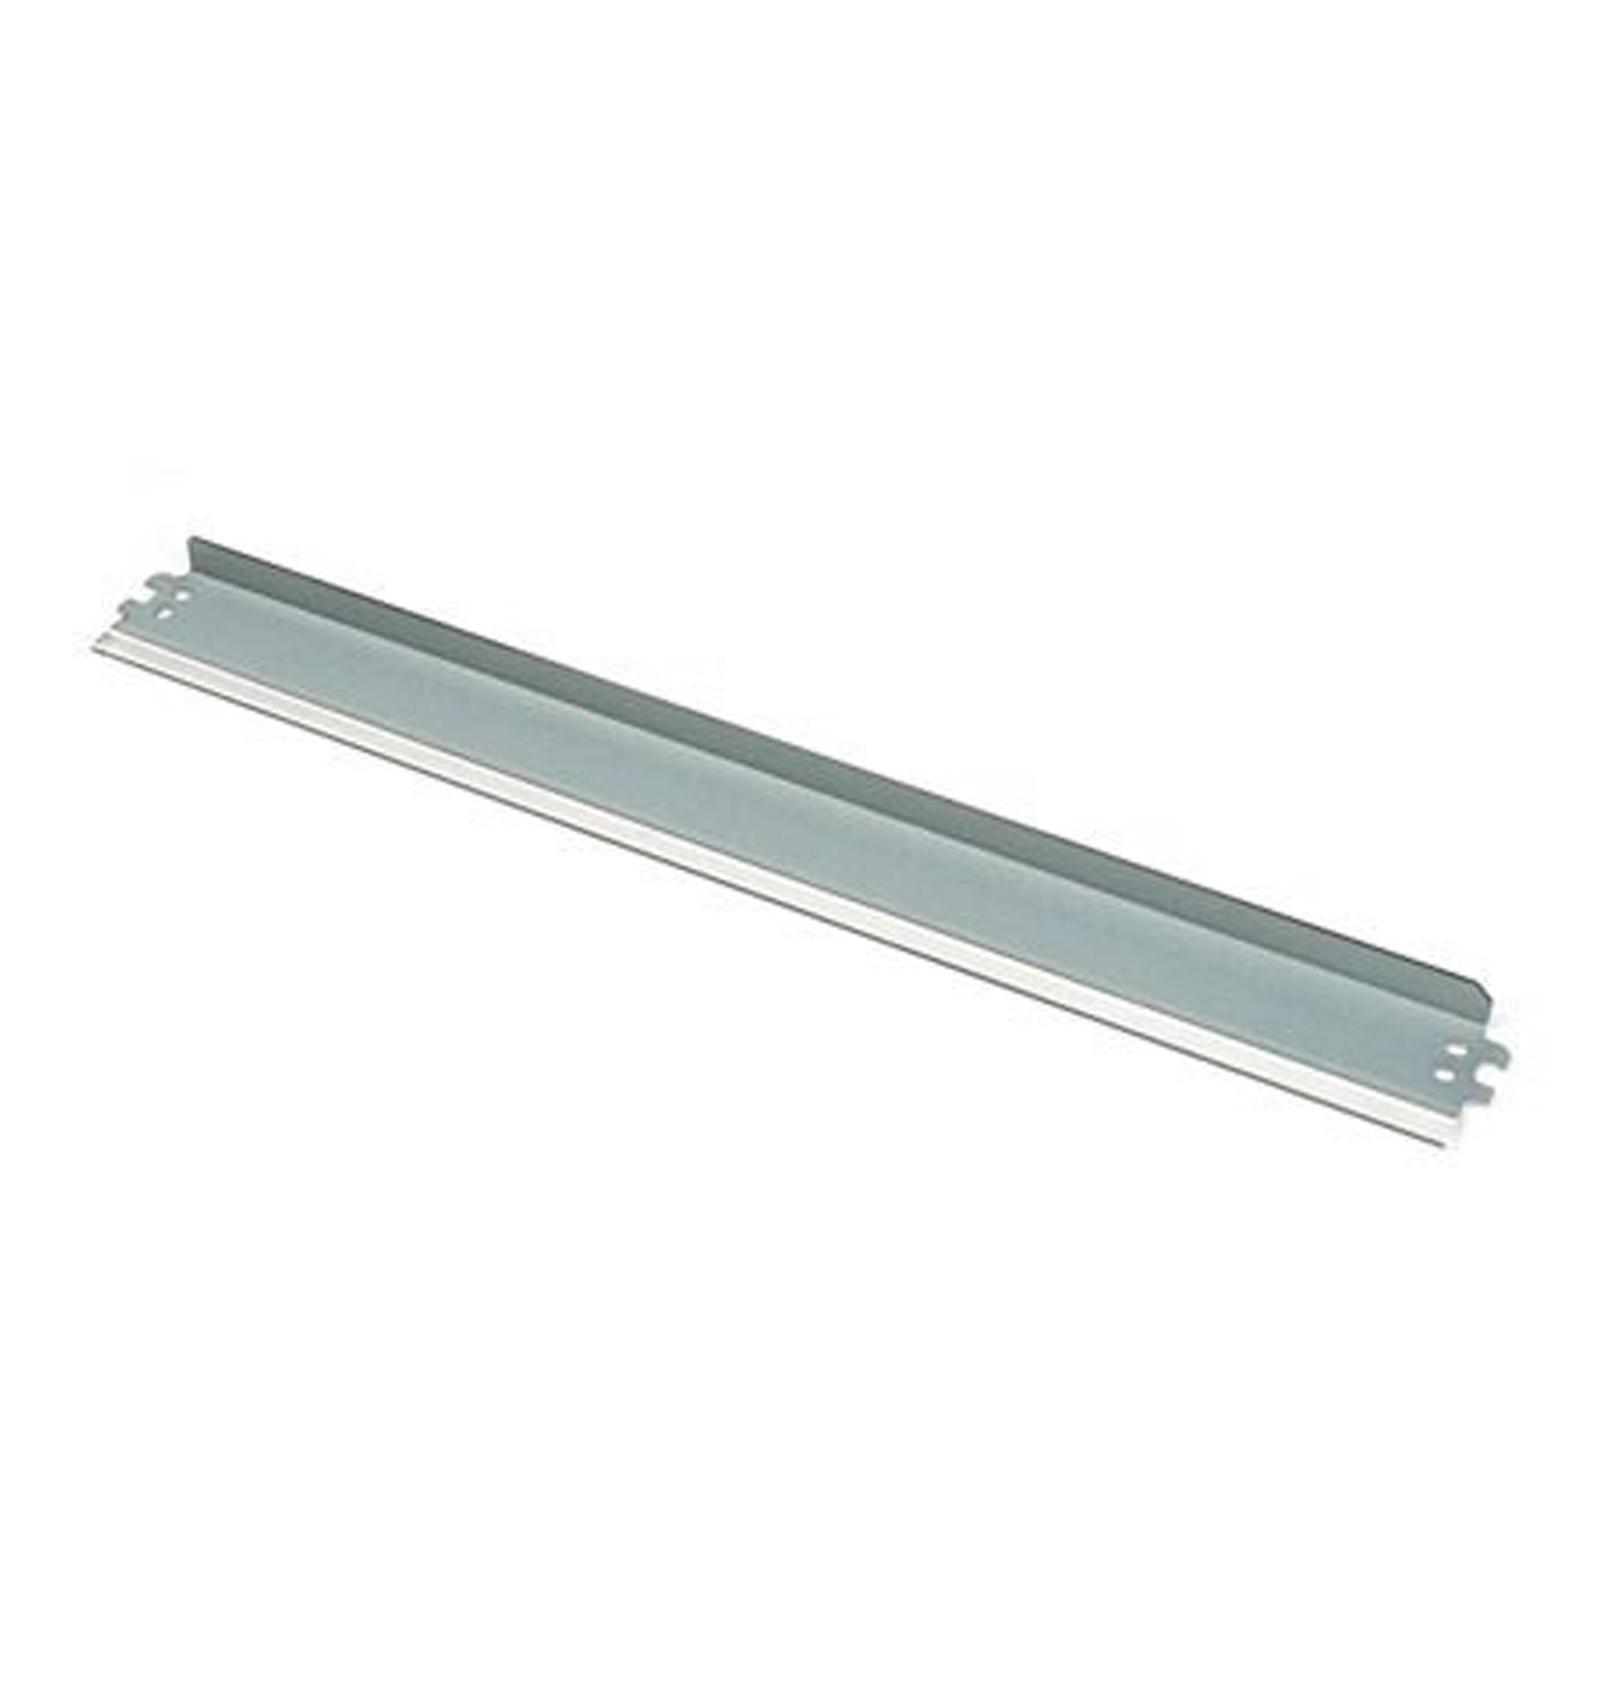 Замена ракеля картриджа HP CE278A (78A) для LaserJet Pro P1566, P1606dn, M1530, M1536.